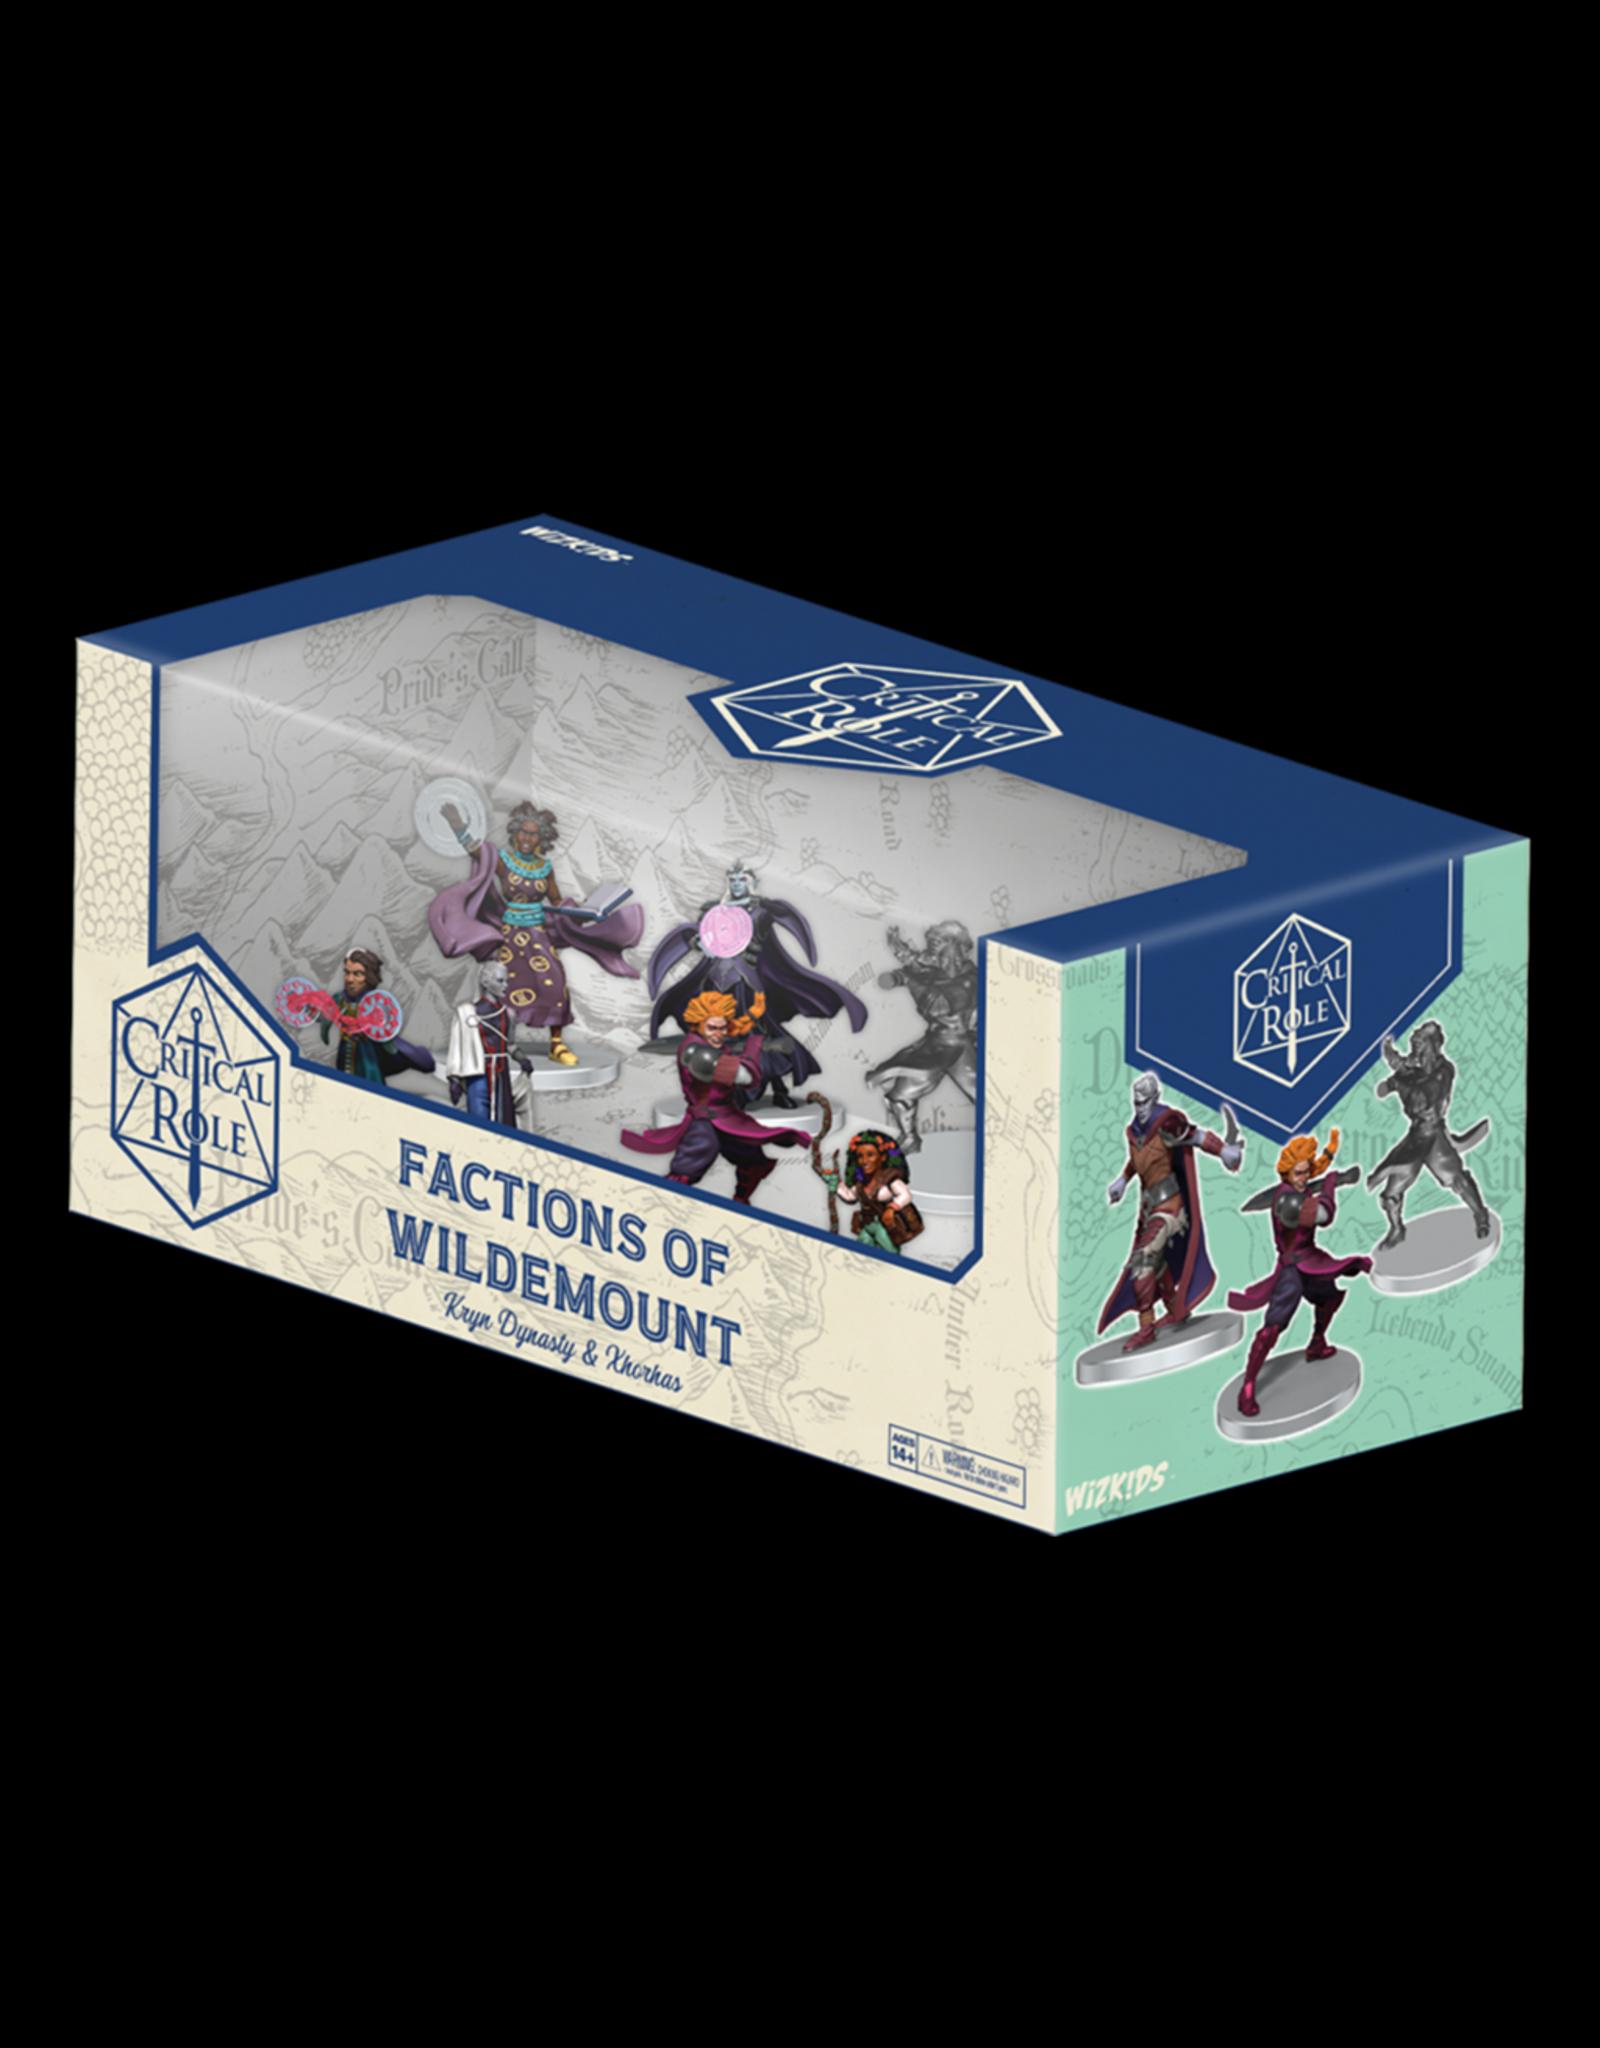 Wiz Kids Critical Role: Factions of Wildemount Kryn Dynasty & Xhorhas Box Set